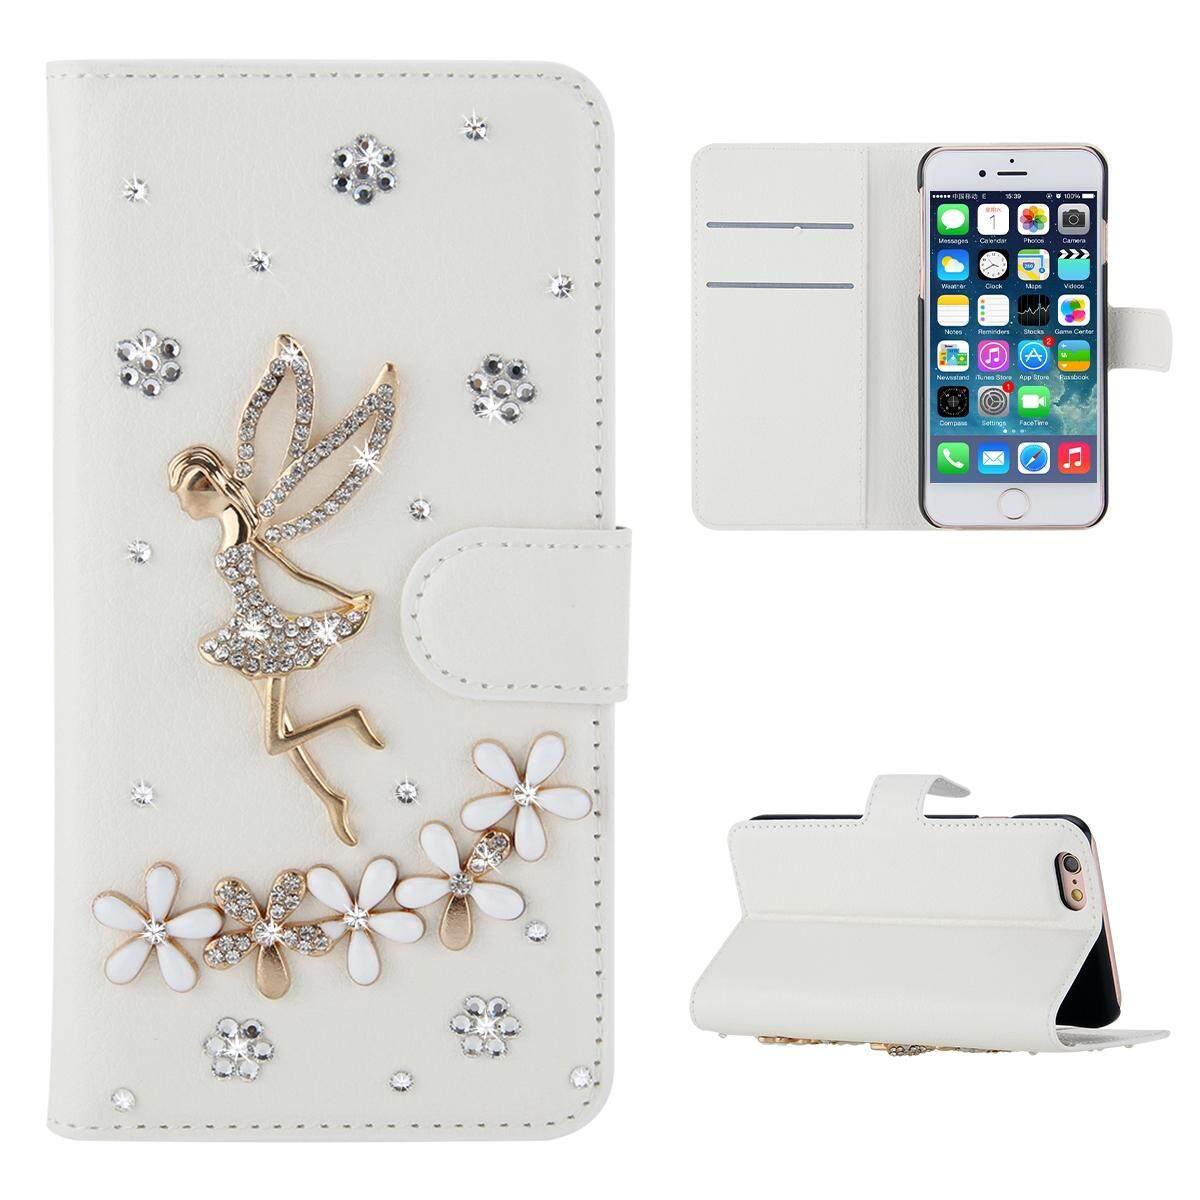 AS Beauty Case for Lenovo ZUK Edge Luxury 3D Bling Angel Flower Diamond Rhinestones PU Leather Wallet Case - intl